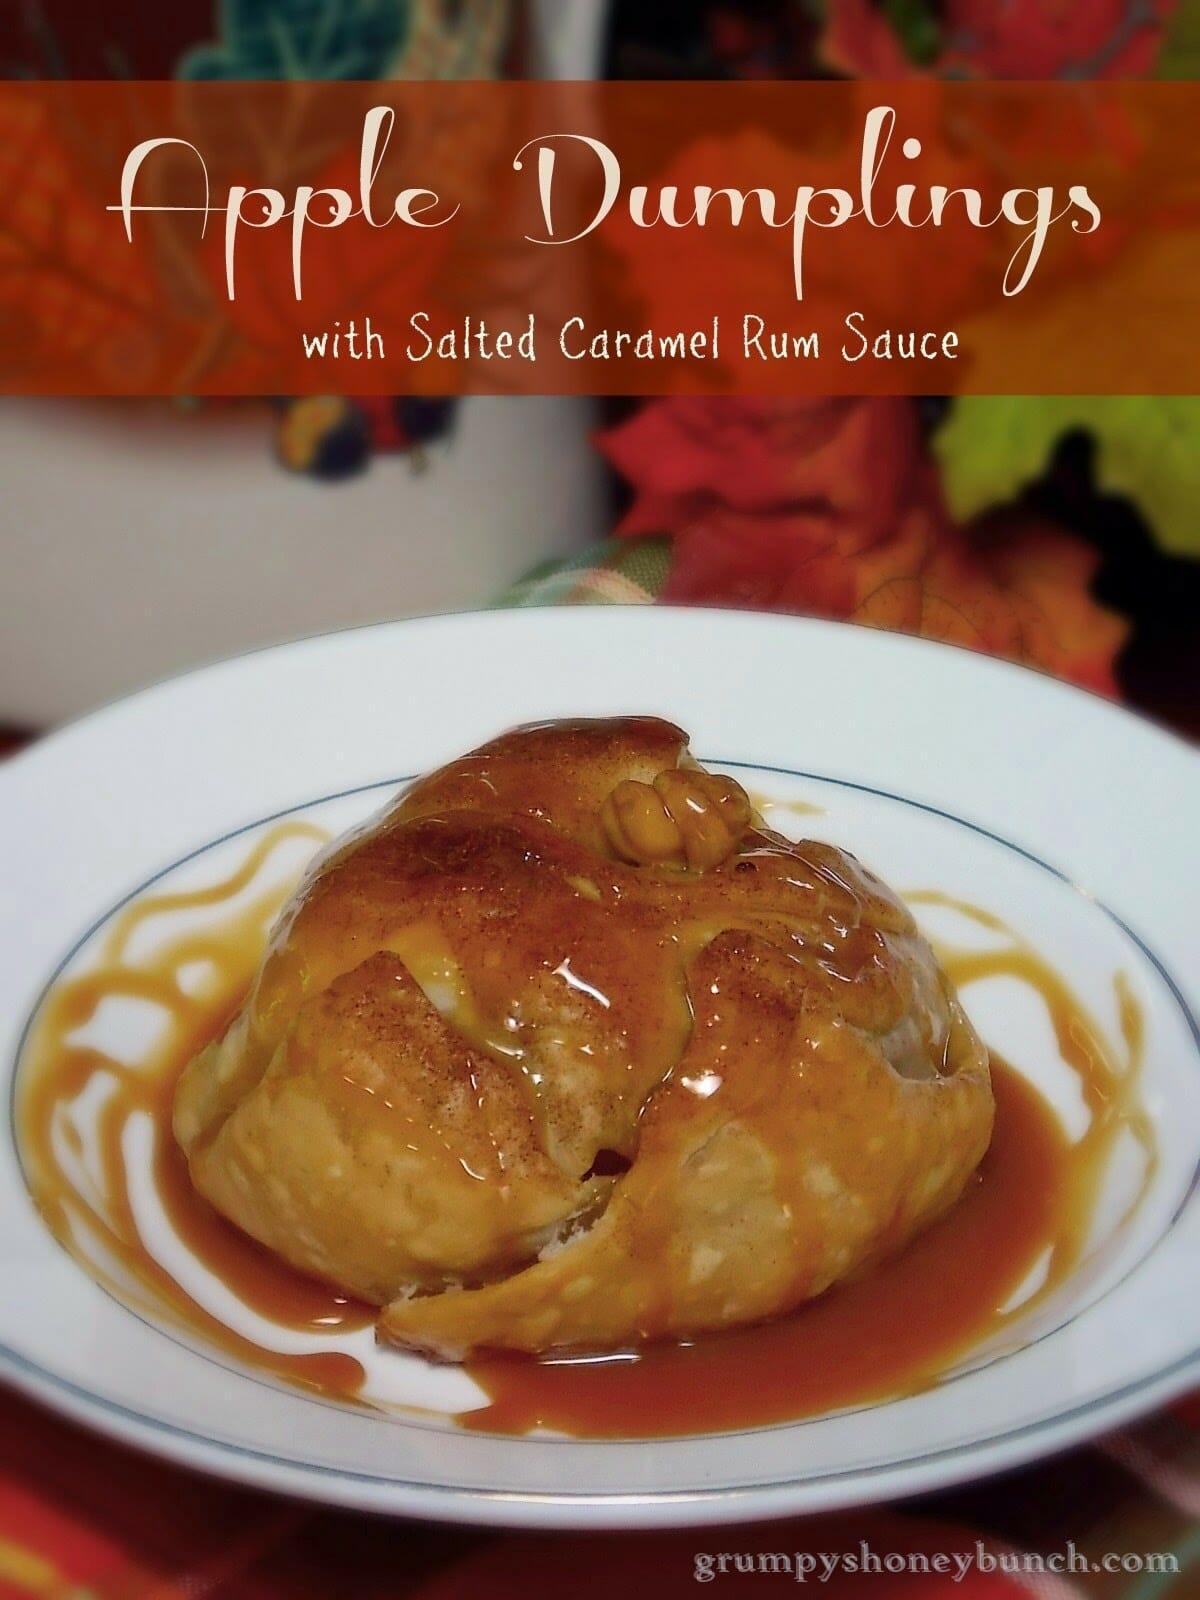 Apple Dumplings with Salted Caramel Rum Sauce